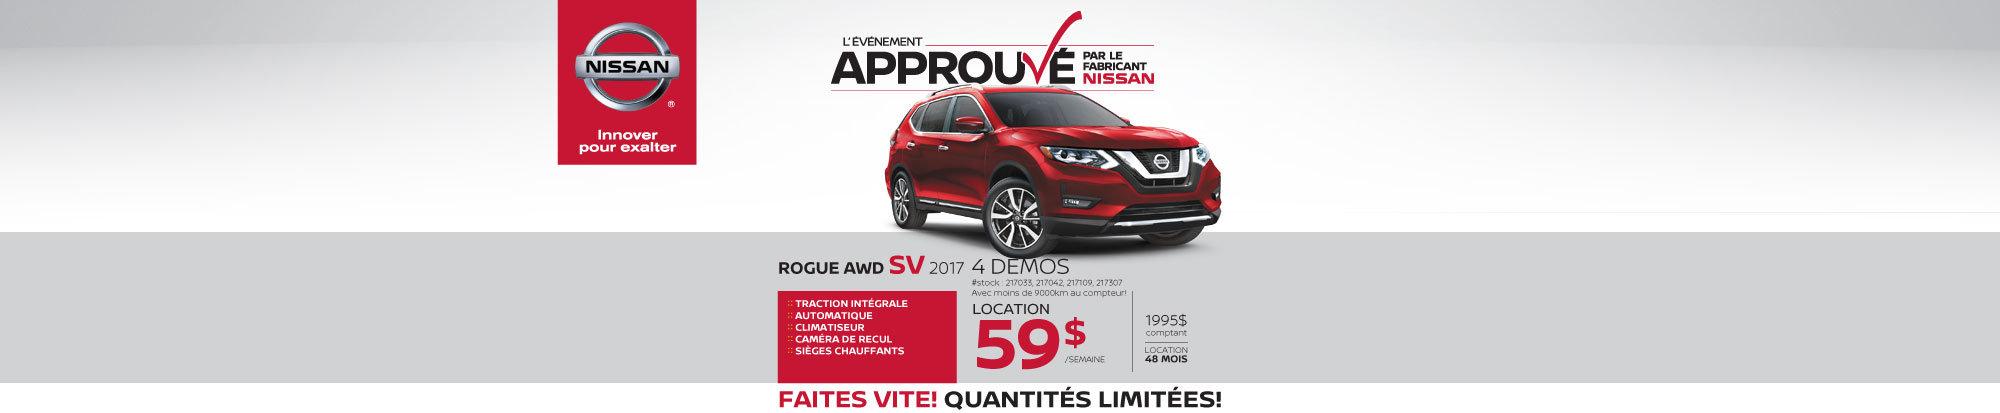 Nissan Rogue 2017 St-Hyacinthe